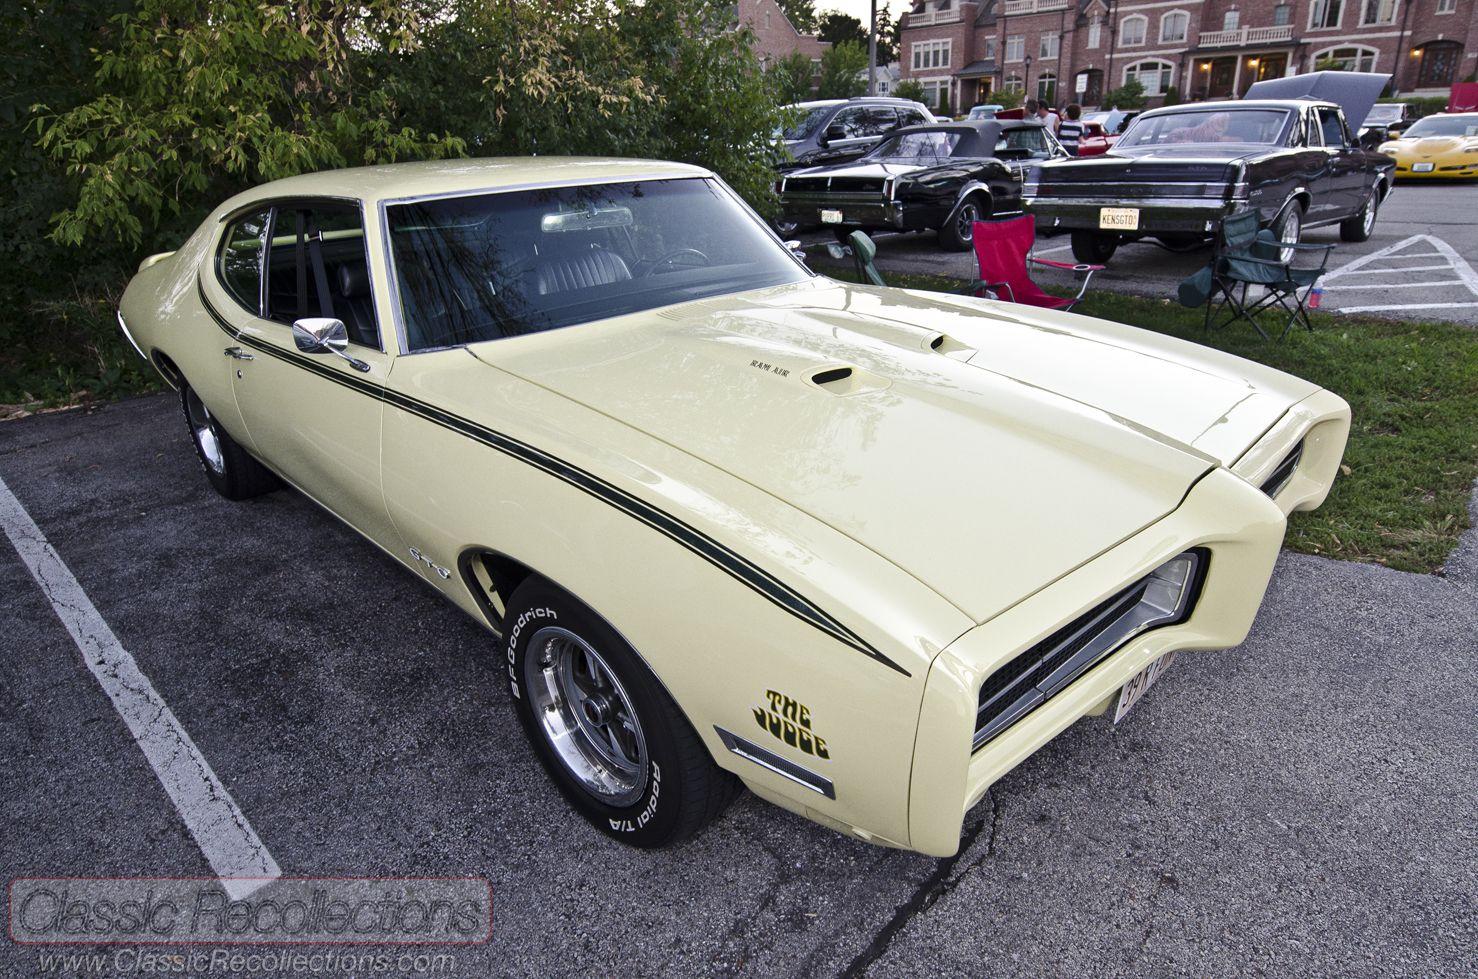 On The Road 1969 Pontiac Gto Judge Year I Was Born 1960s